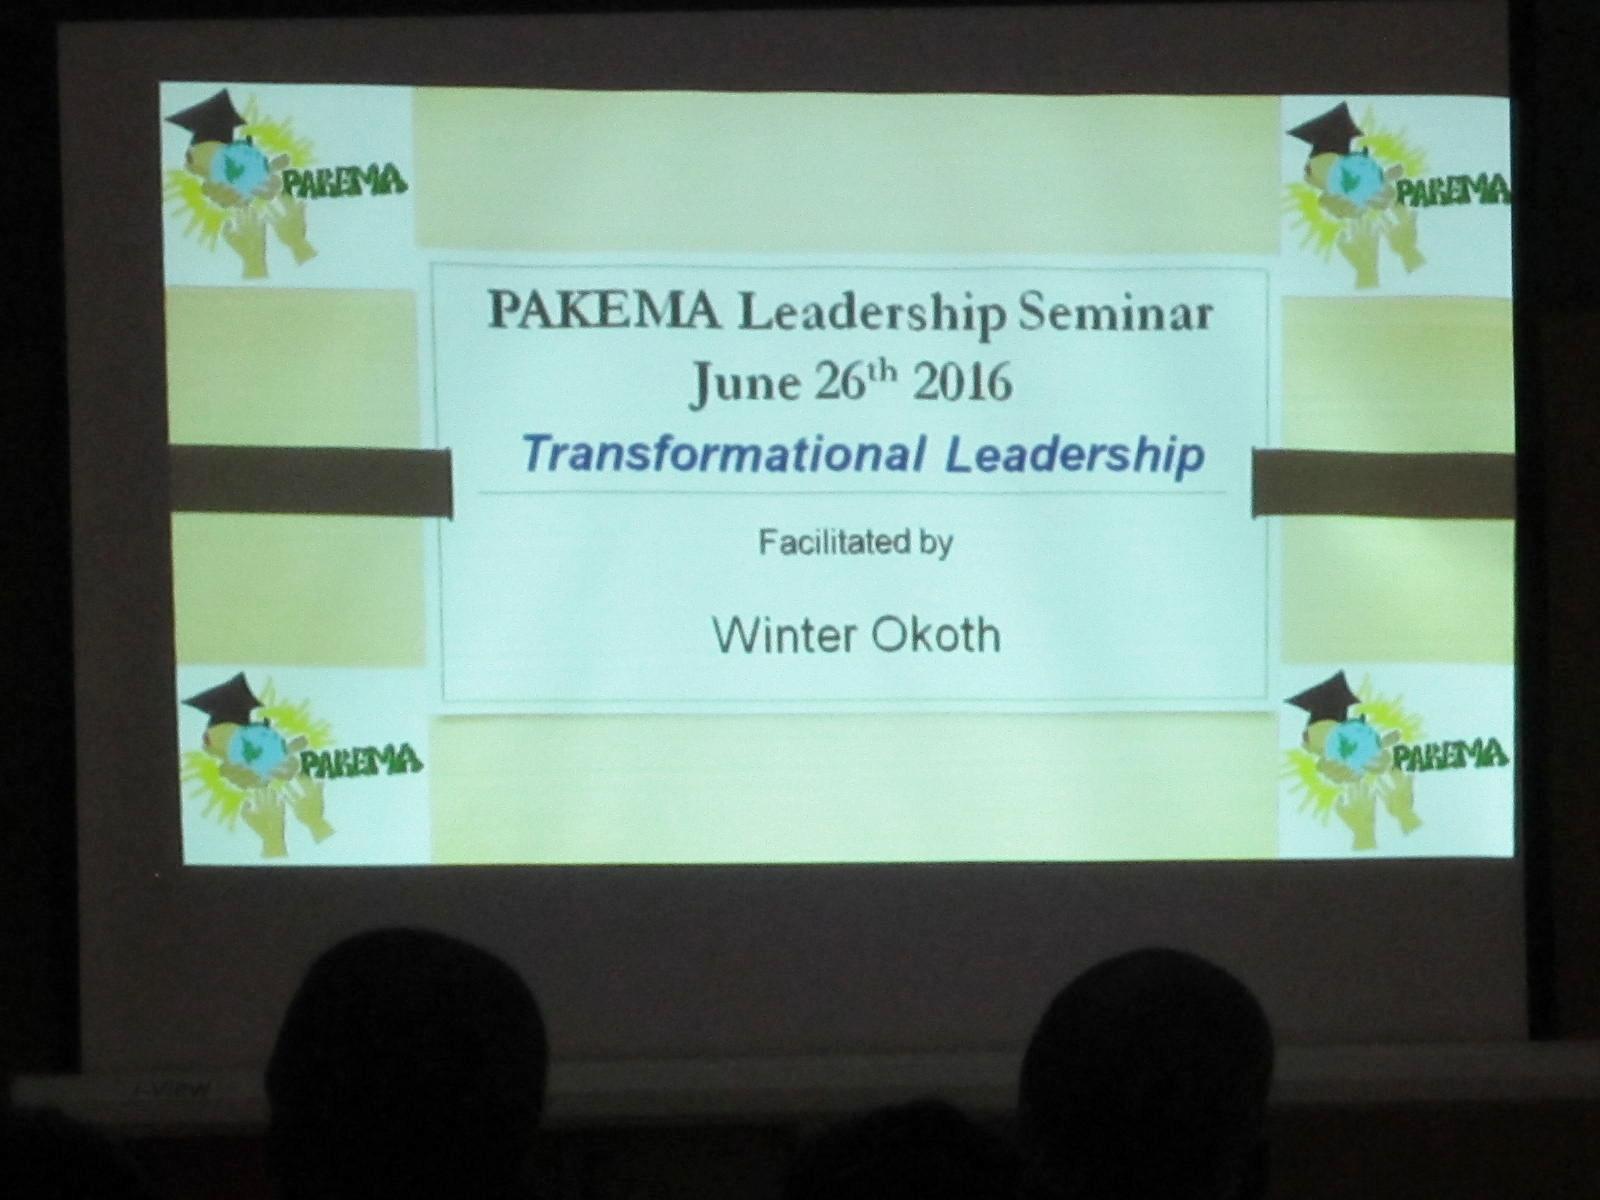 PAKEMA Leadership Seminar 2016